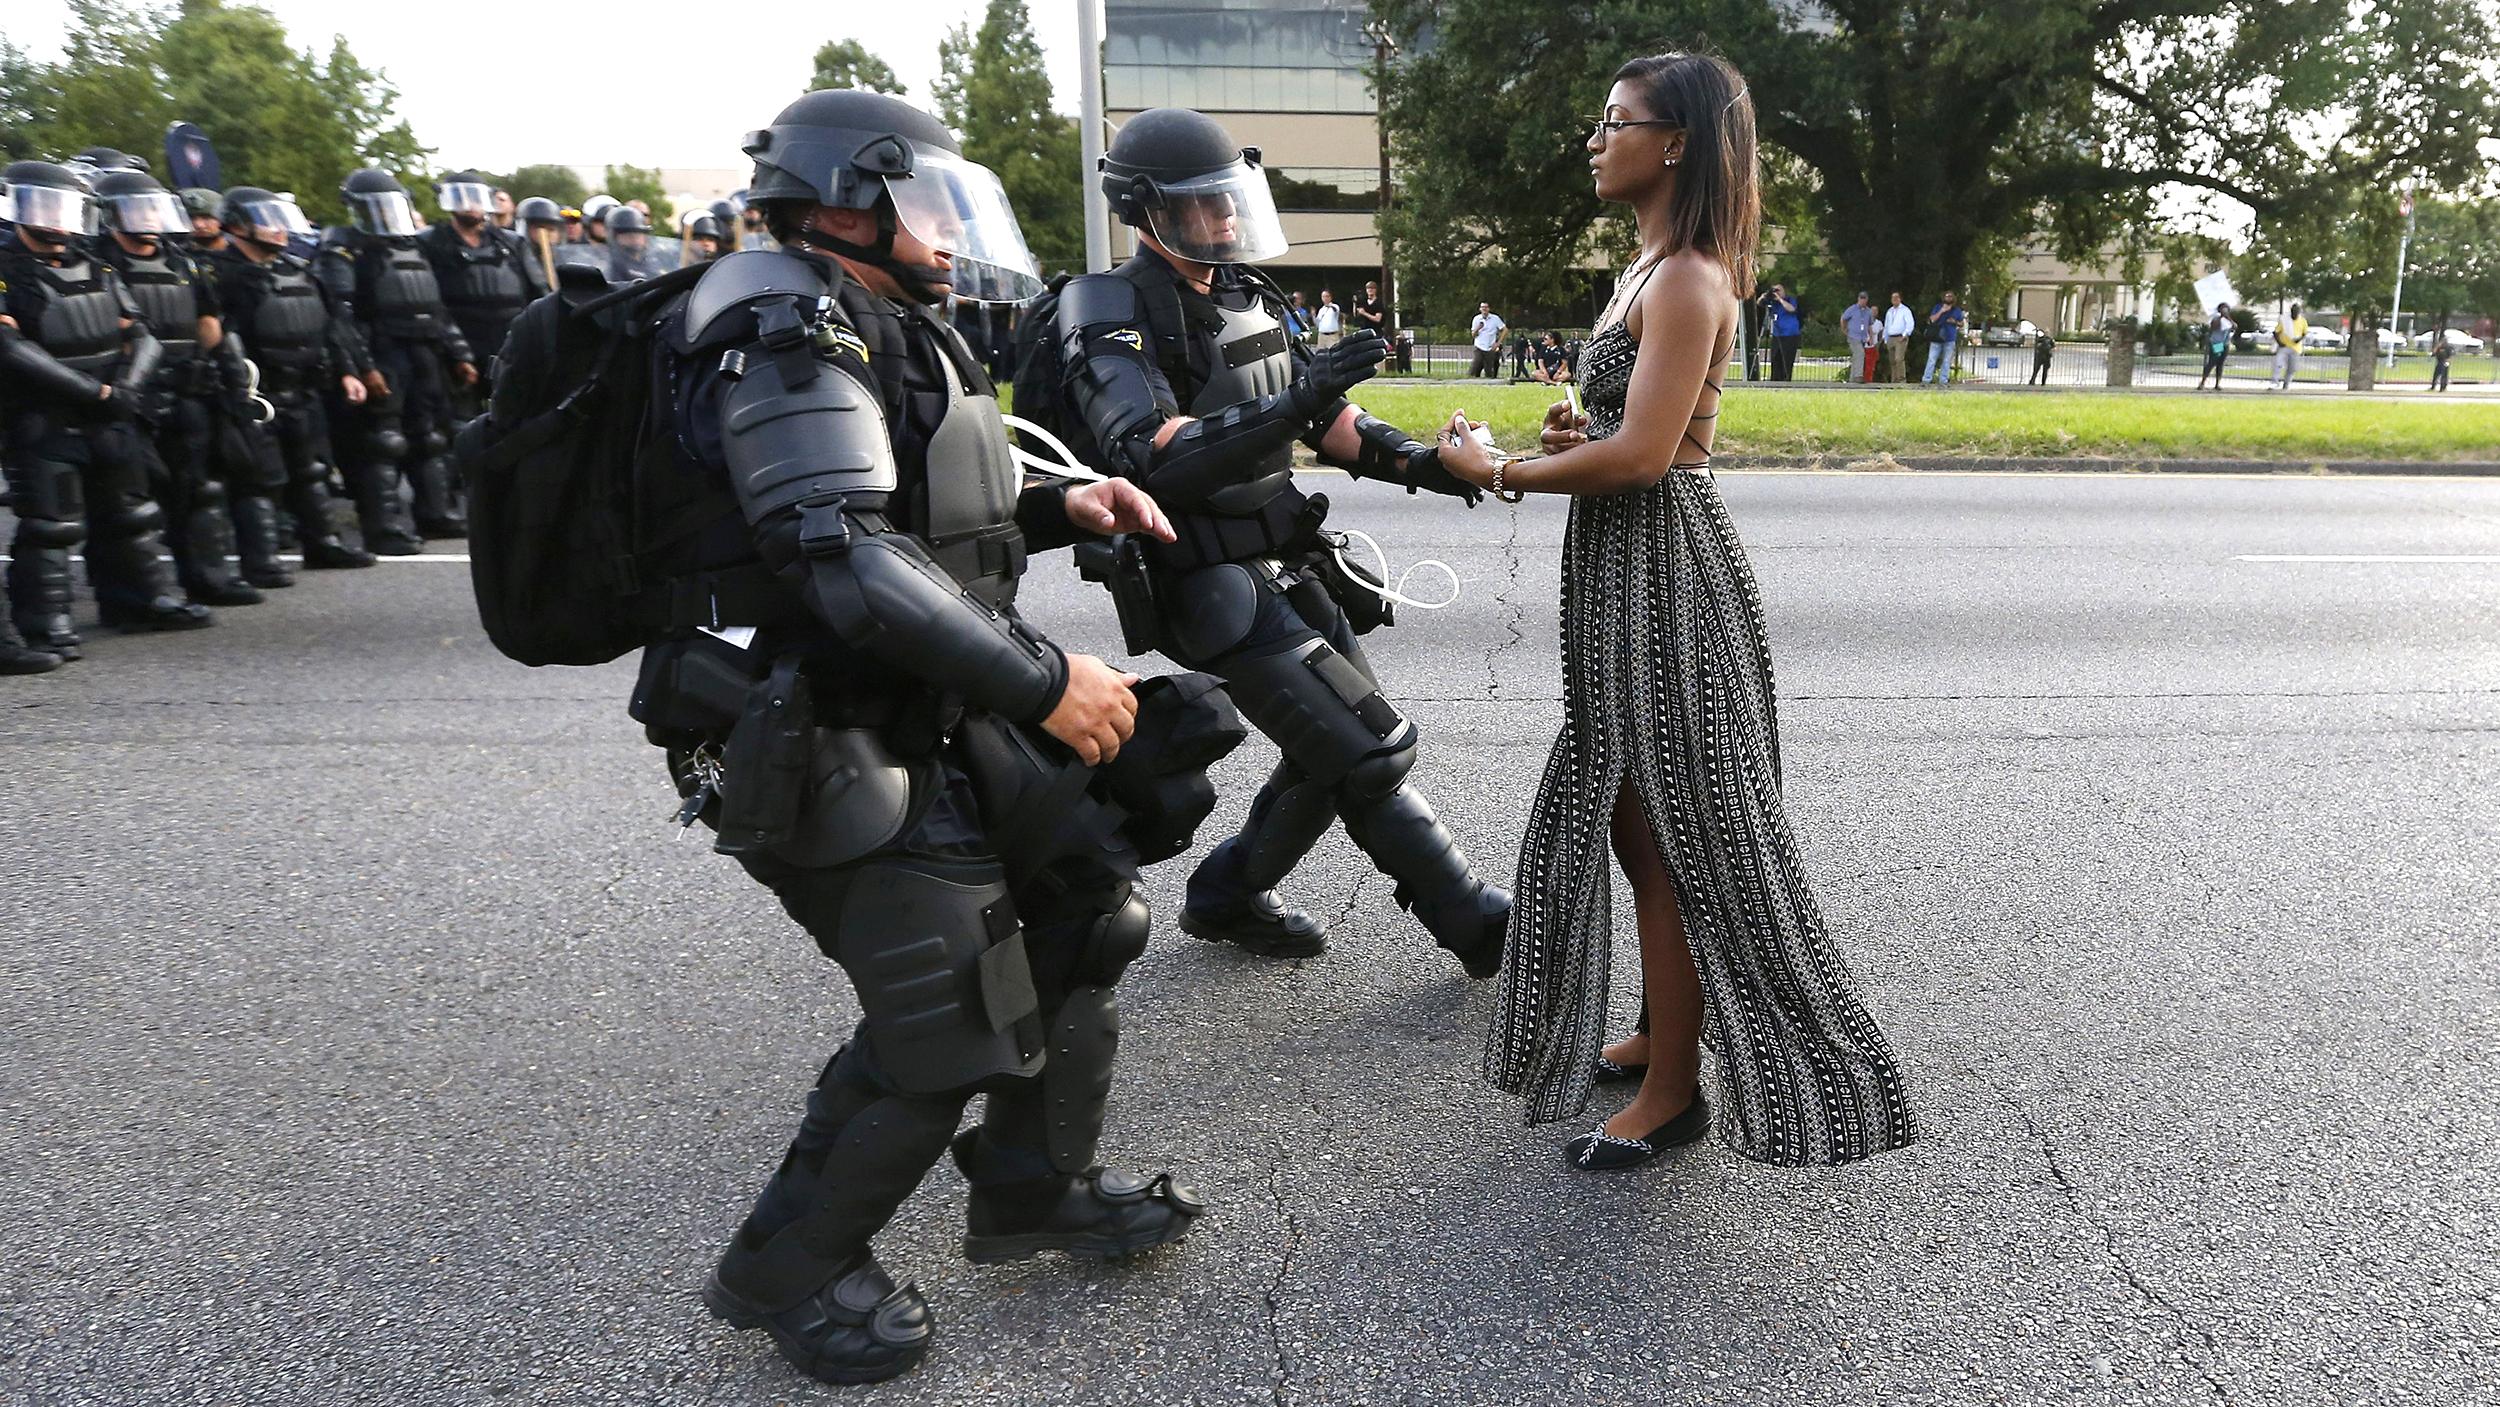 Iesha Evansin Baton Rouge photographed by Jonathan Bachman for Reuters